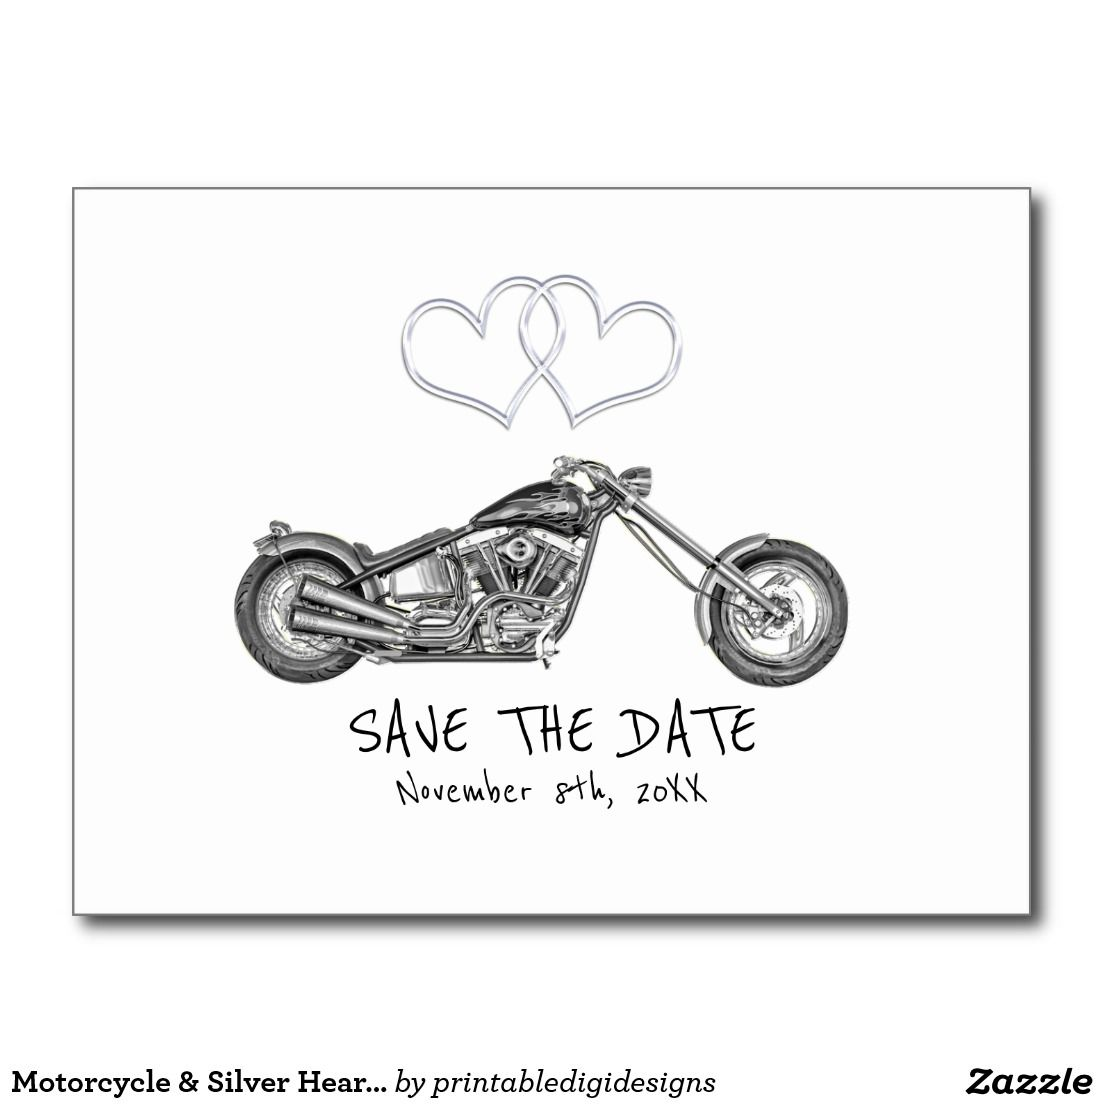 Motorcycle & Silver Hearts Biker Save The Date Postcard   Biker ...